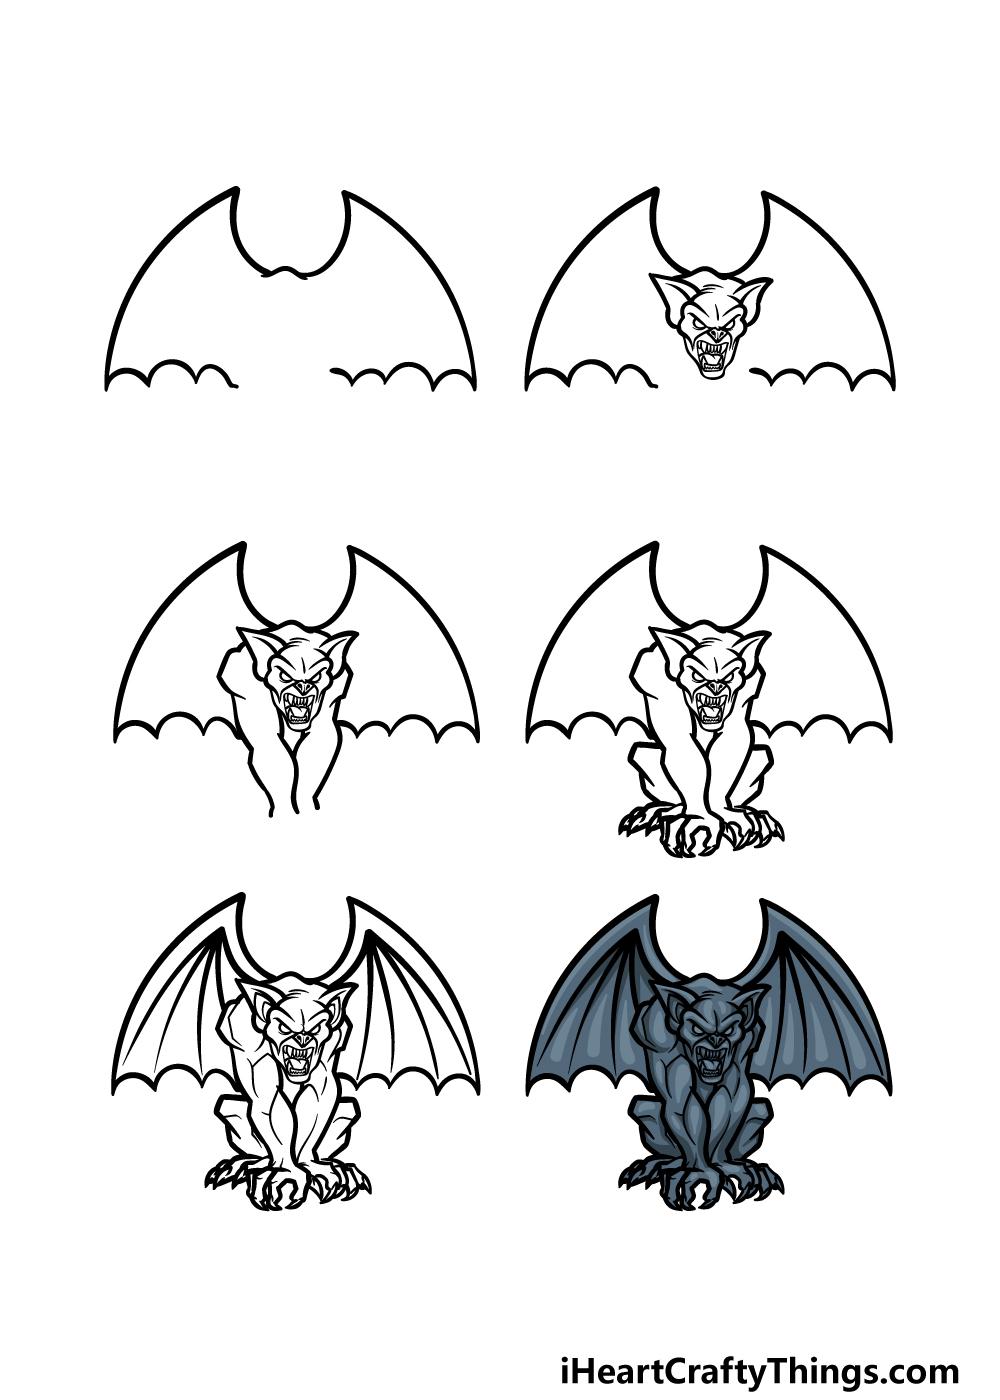 how to draw a Gargoyle in 6 steps